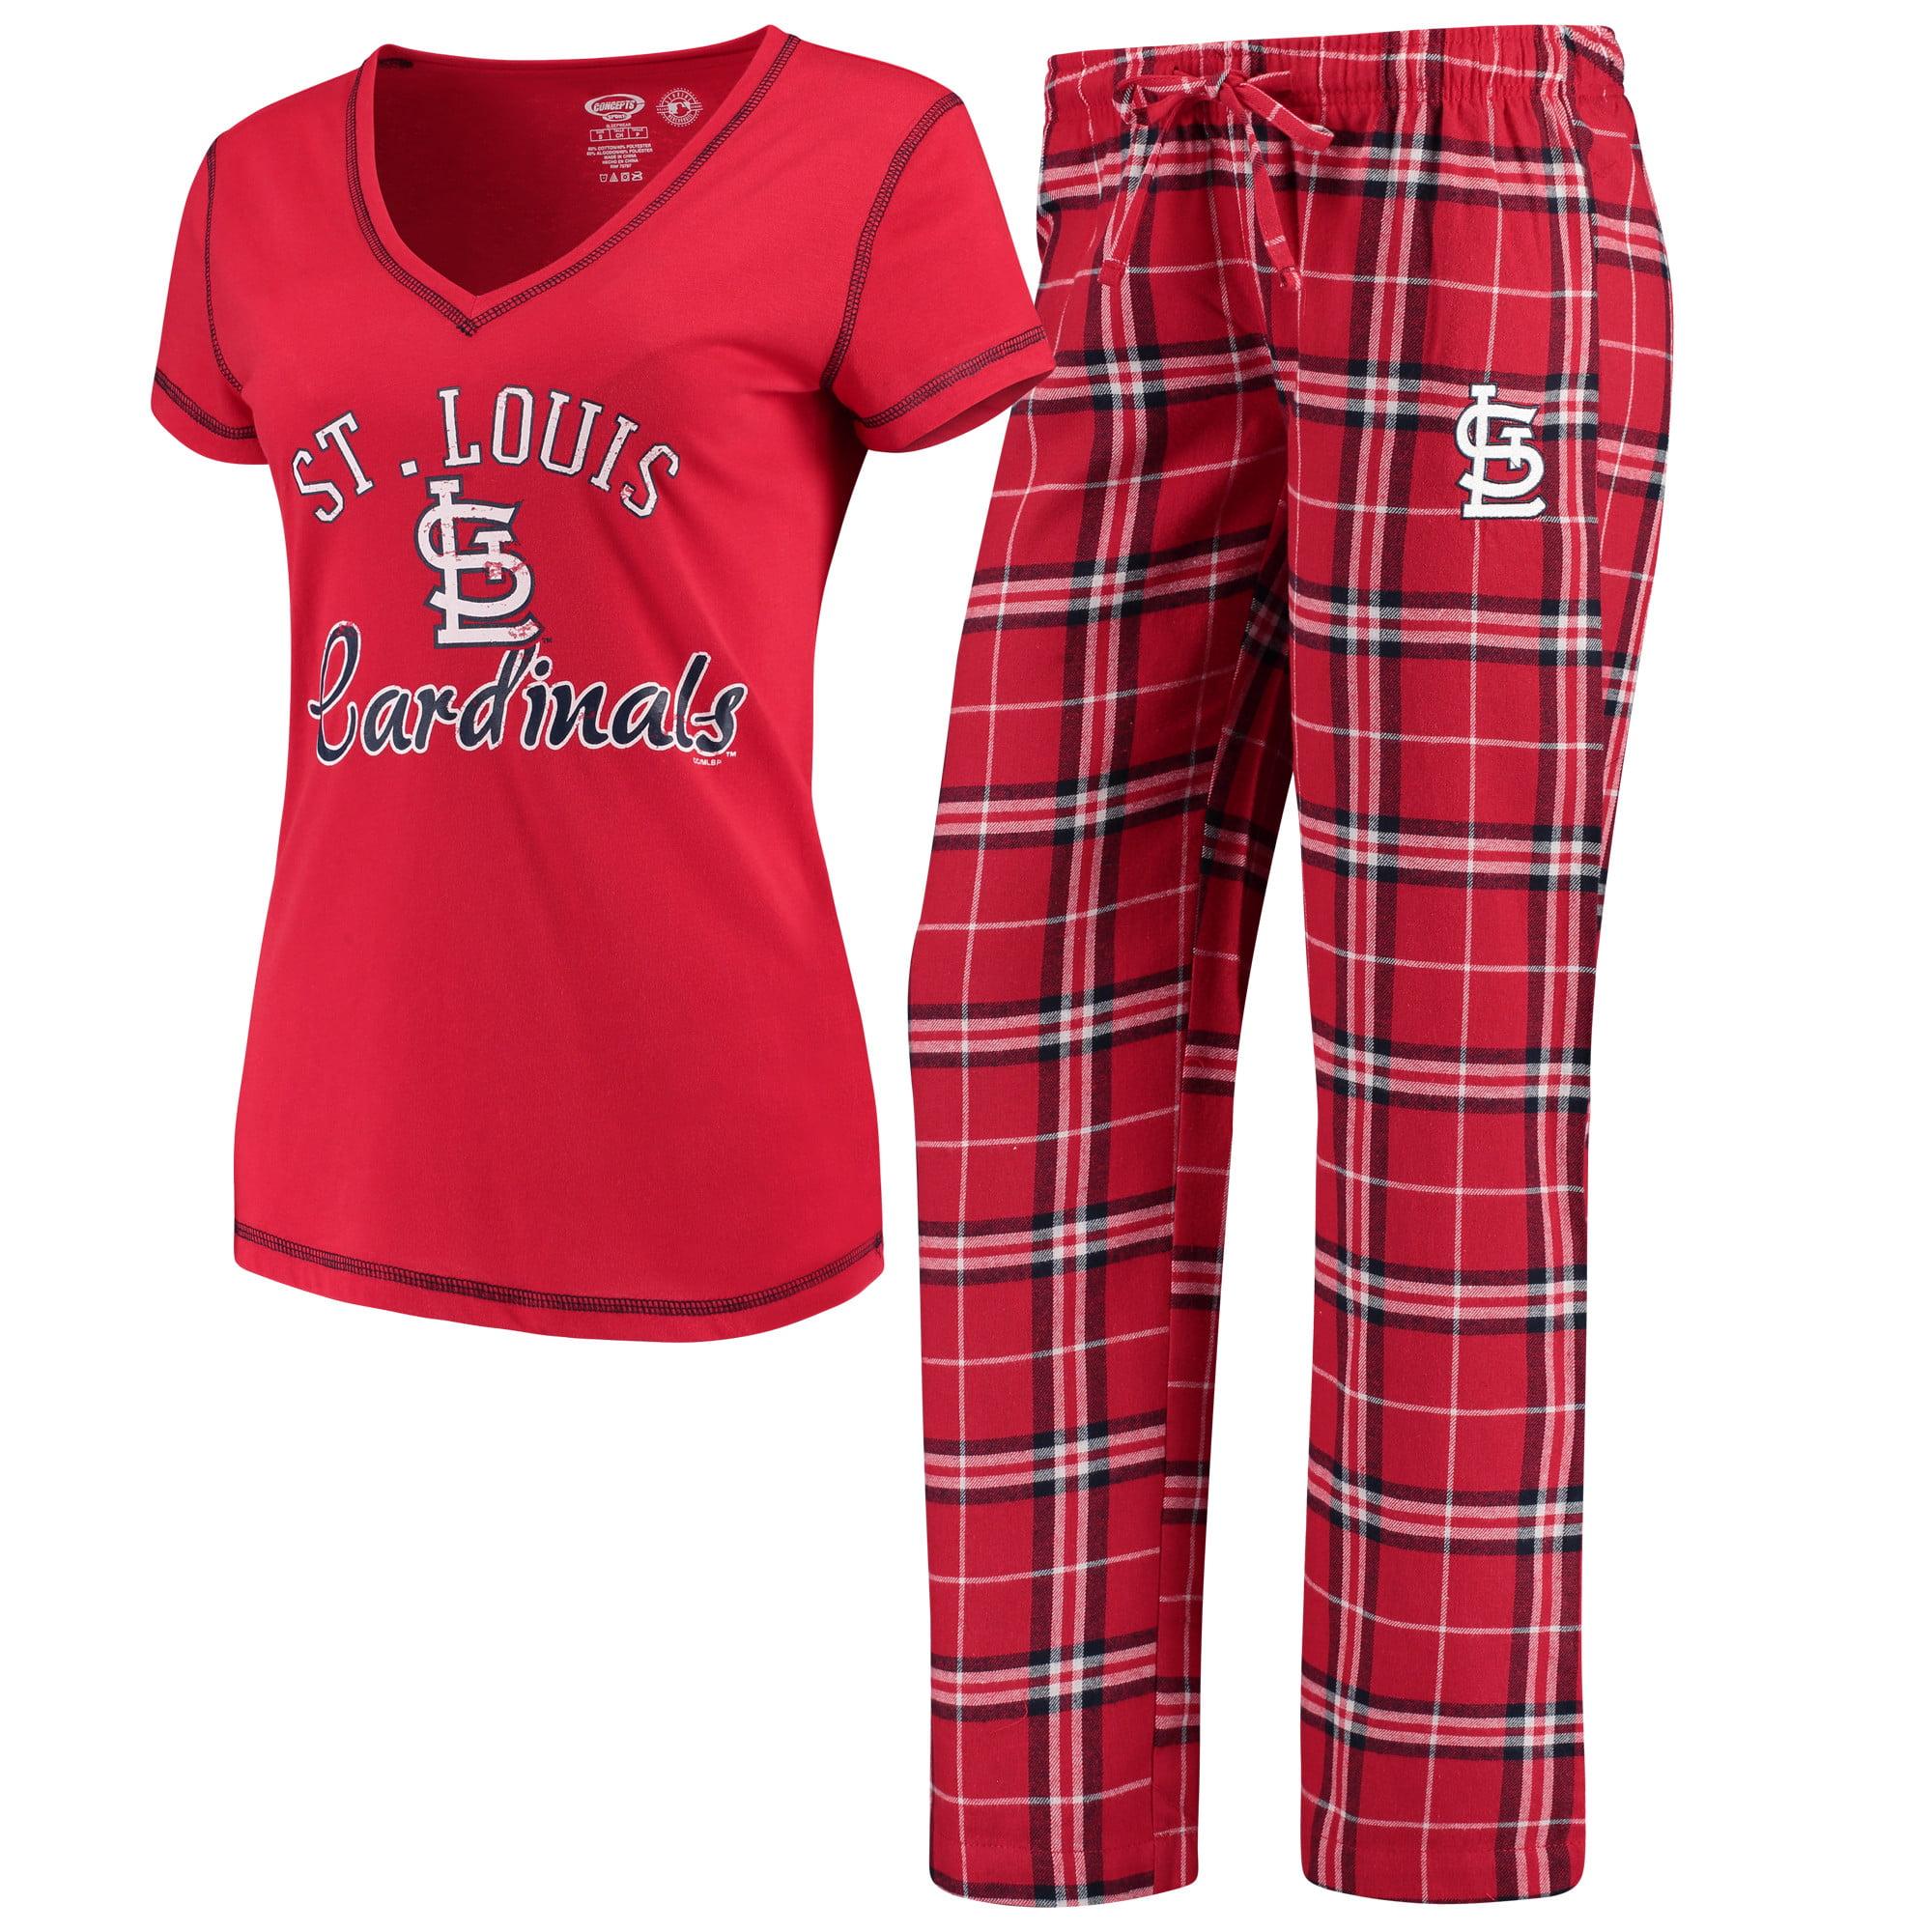 St. Louis Cardinals Concepts Sport Women's Duo Pants & Top Set - Red